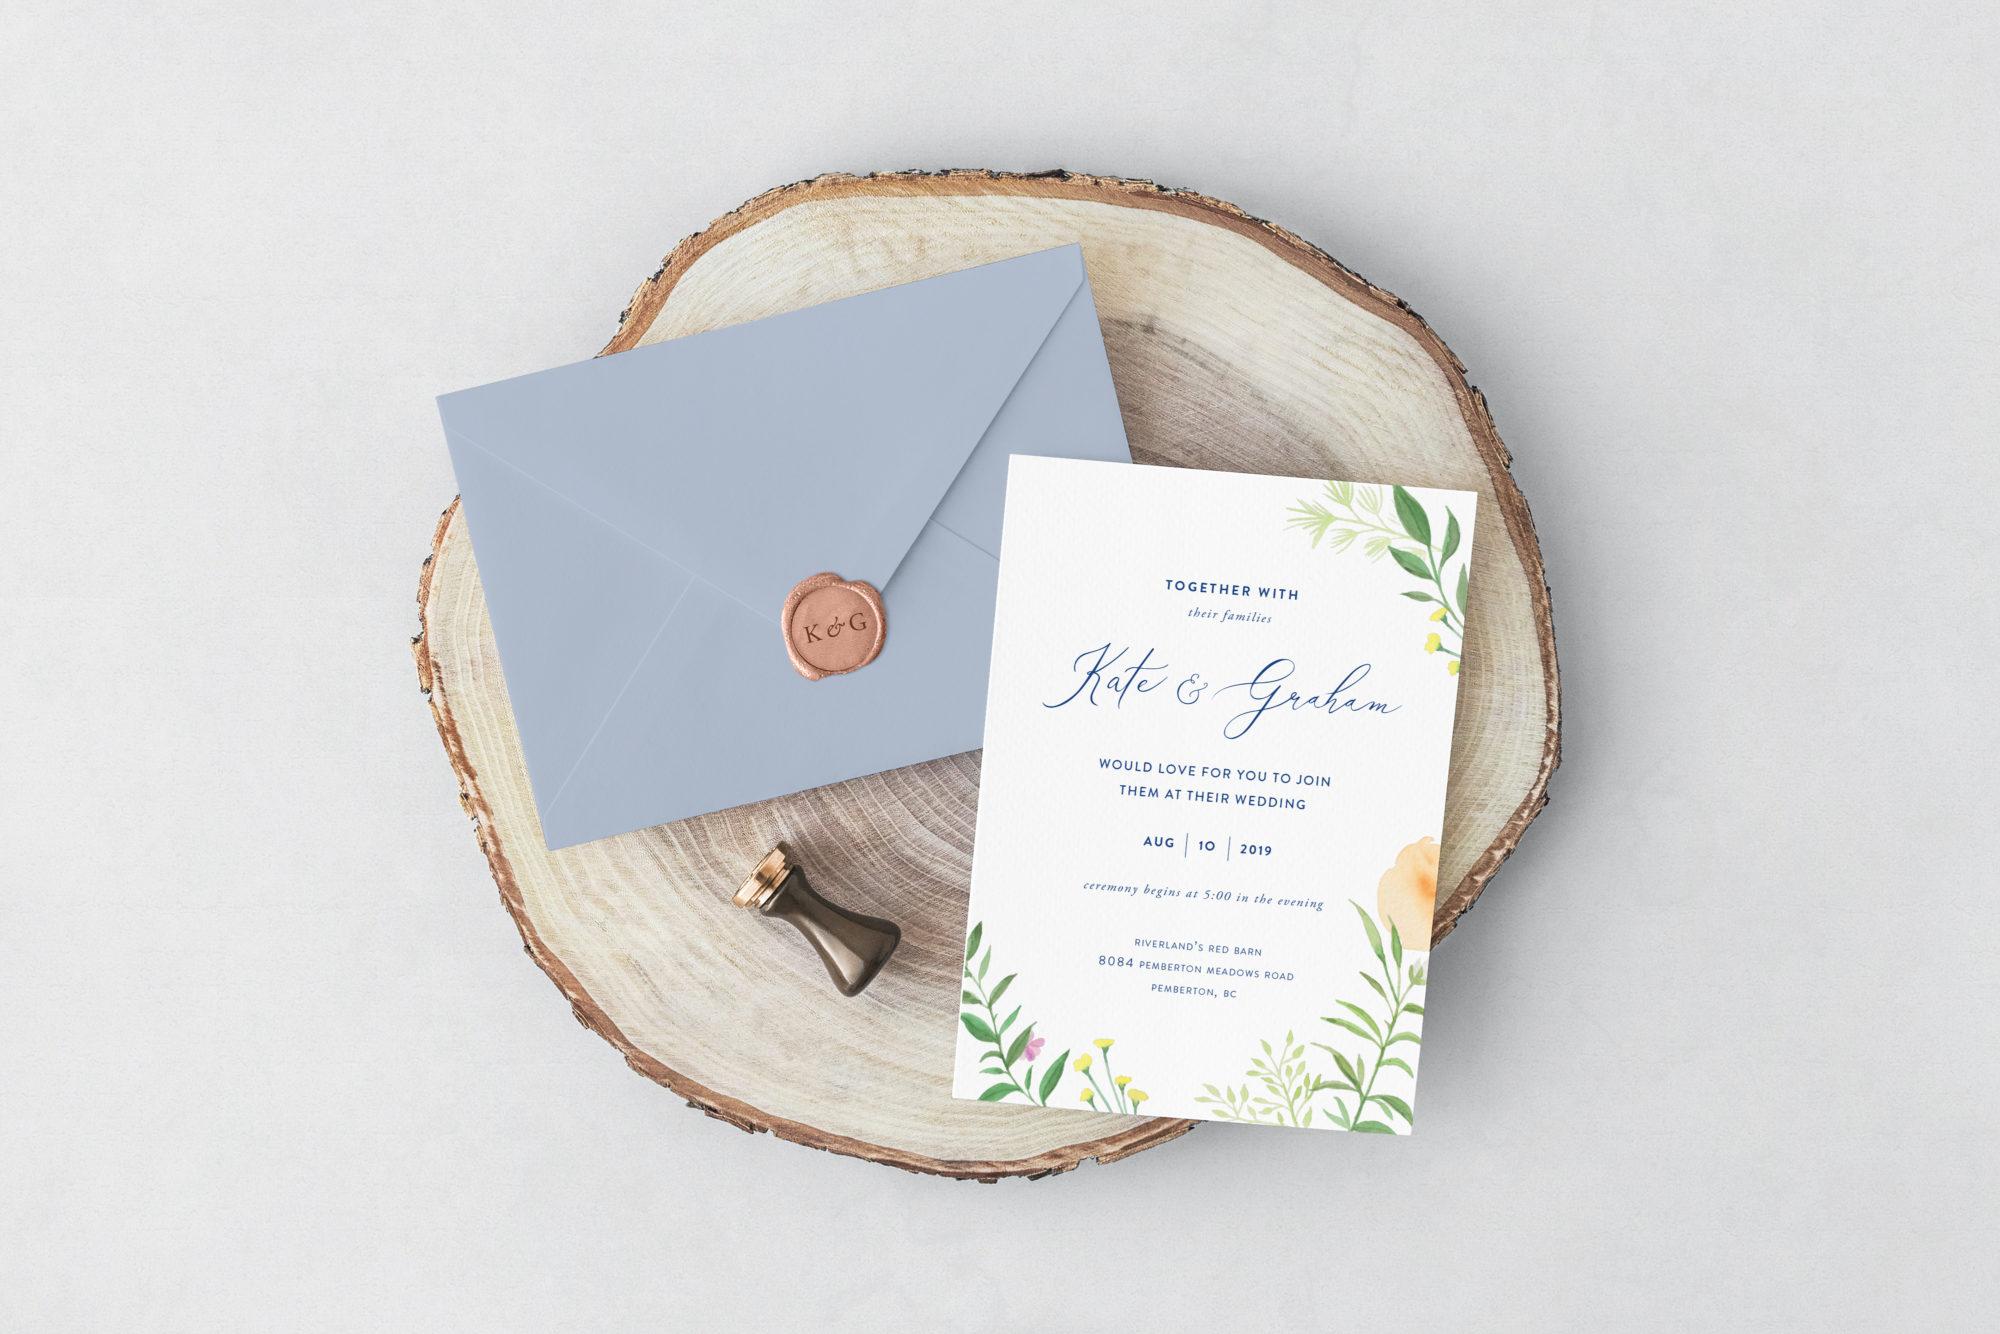 Free Invitation Card & Envelope